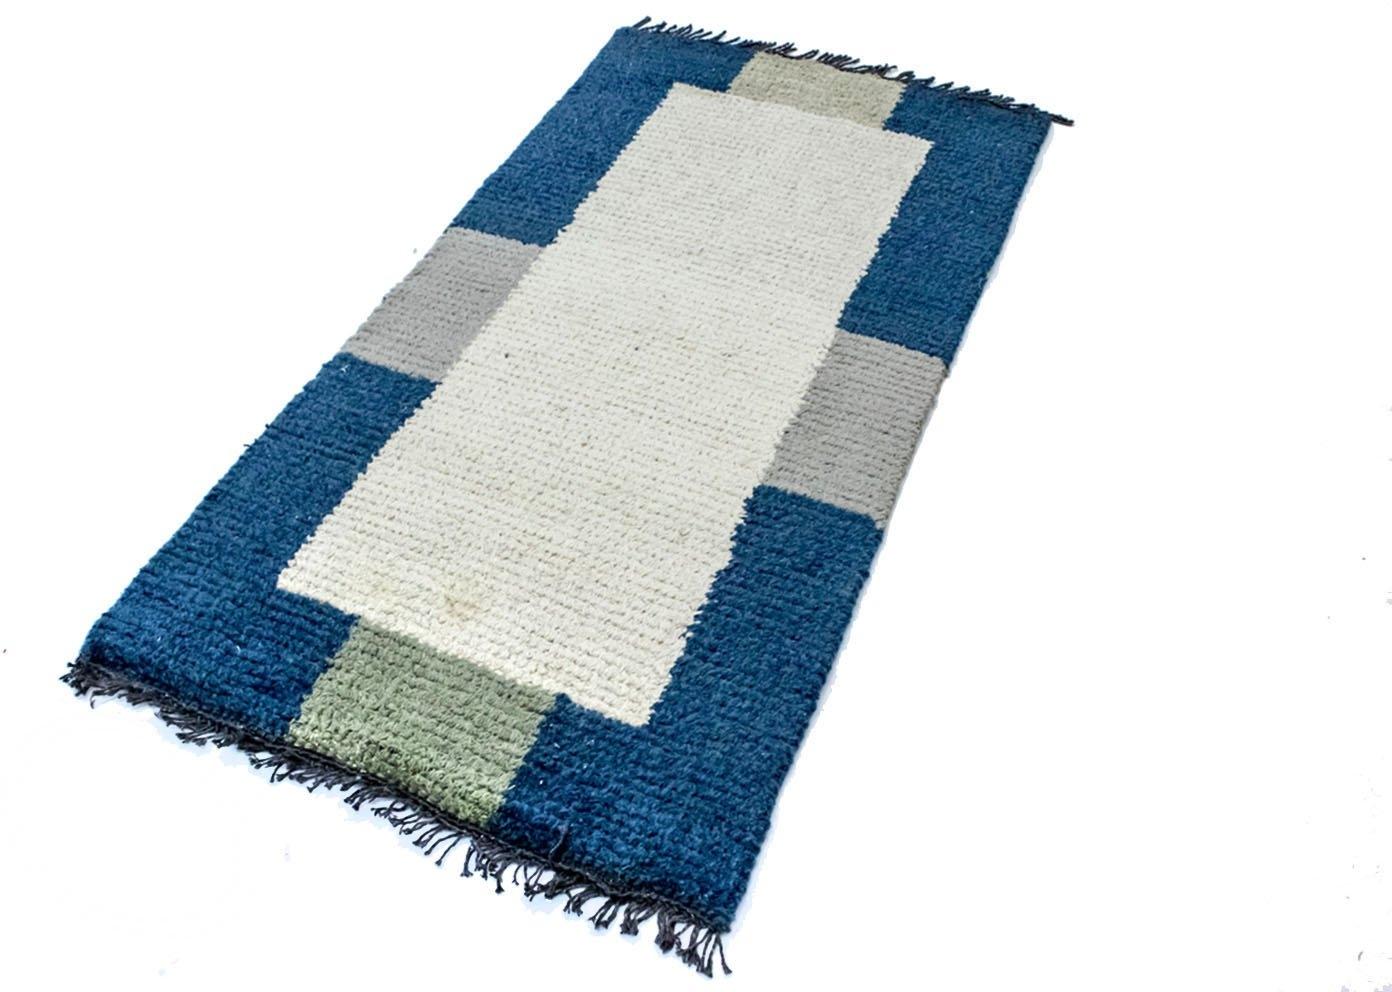 morgenland wollen kleed Nepal Teppich handgeknüpft beige handgeknoopt online kopen op otto.nl